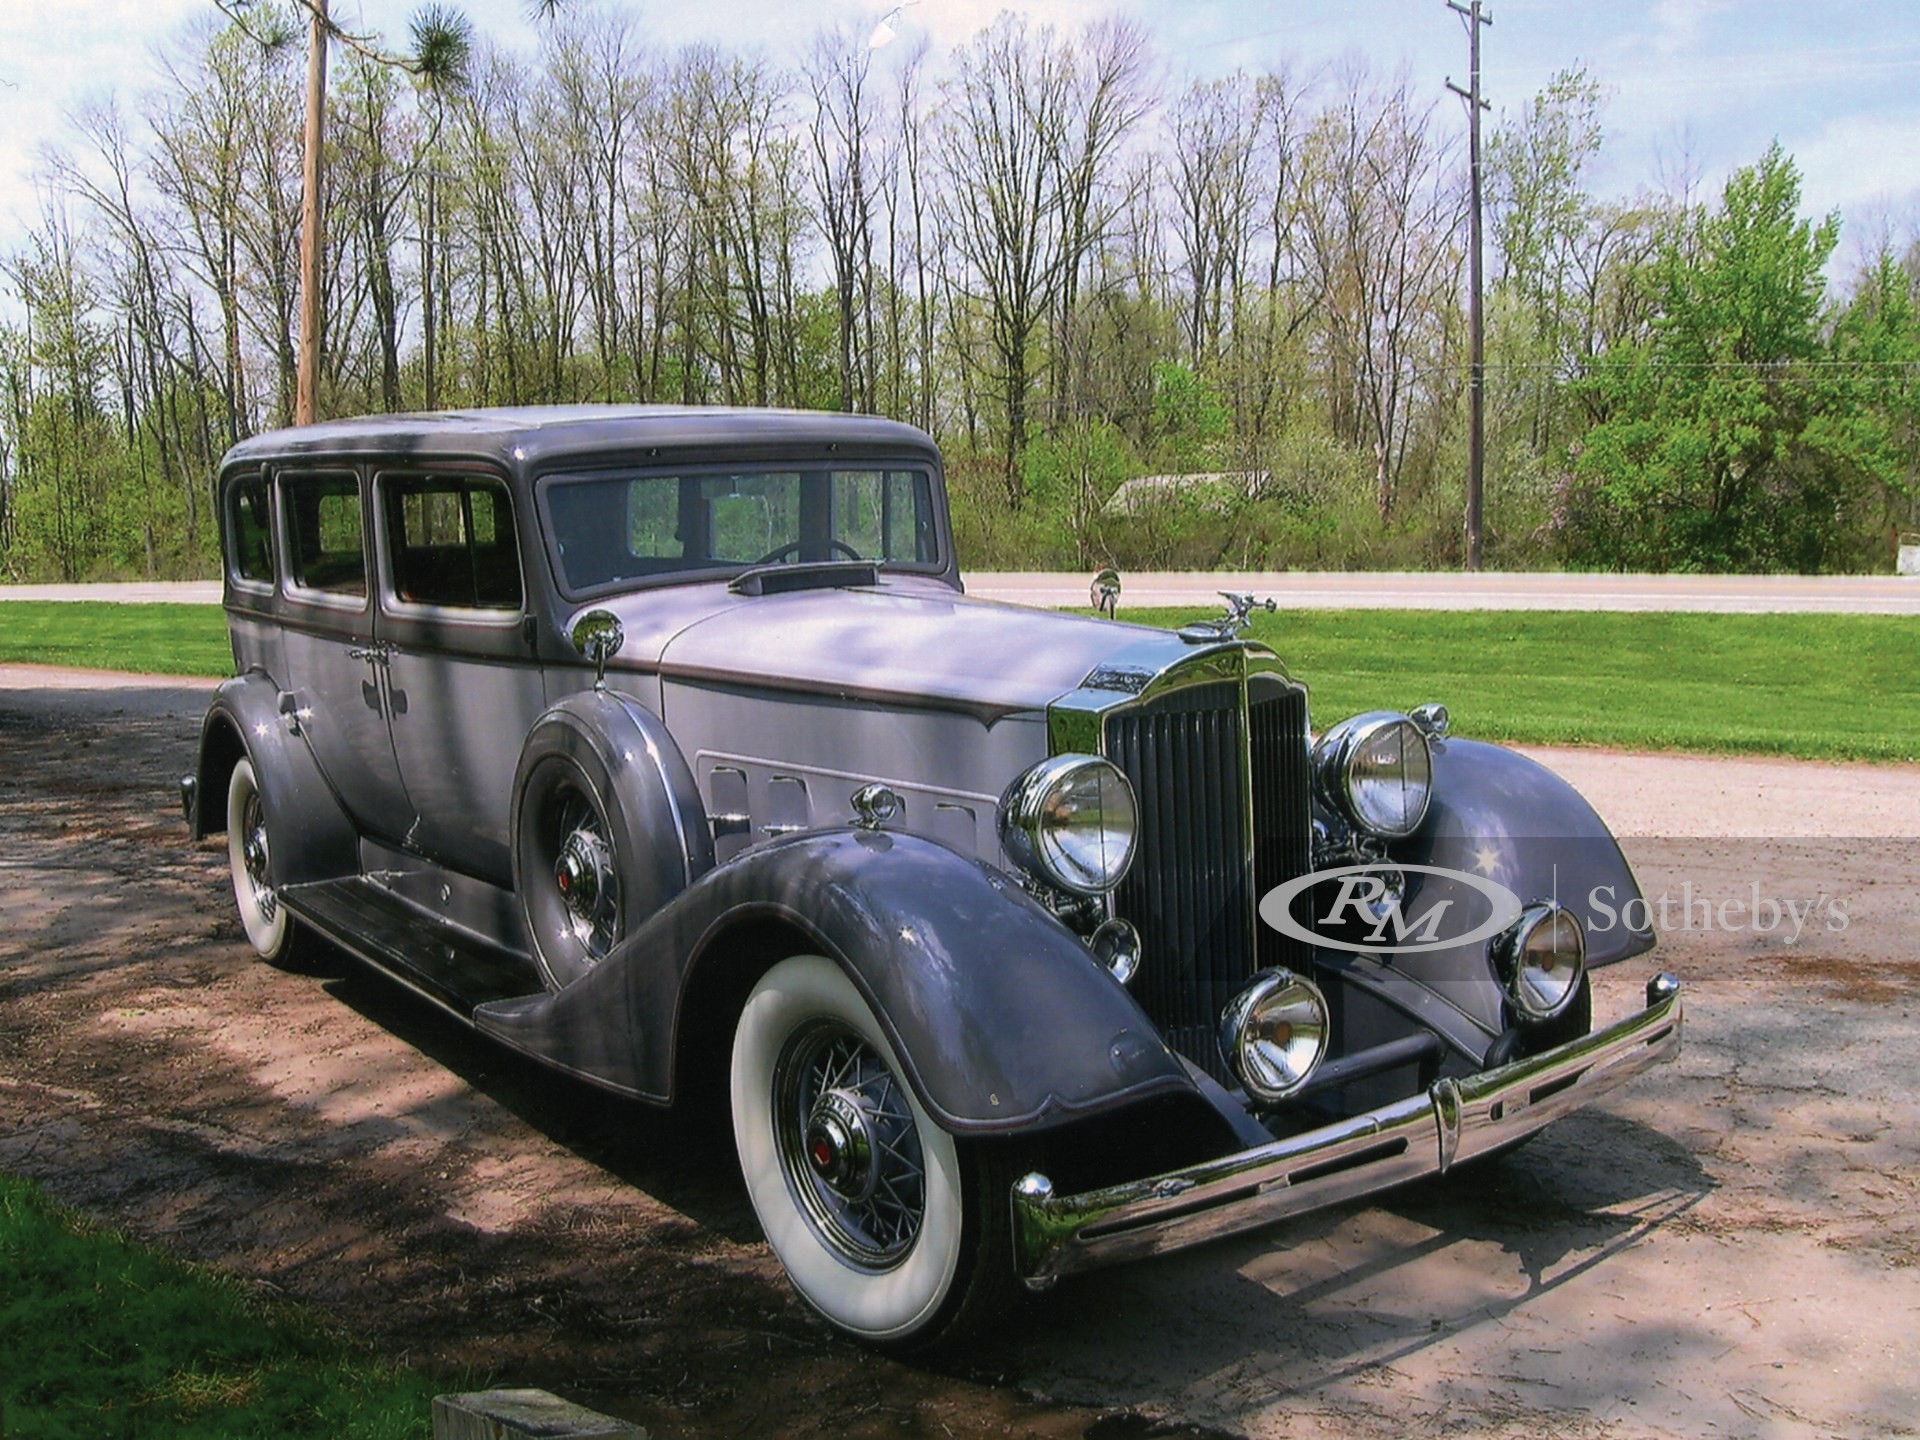 1934 Packard Super 8 Seven Passenger Sedan